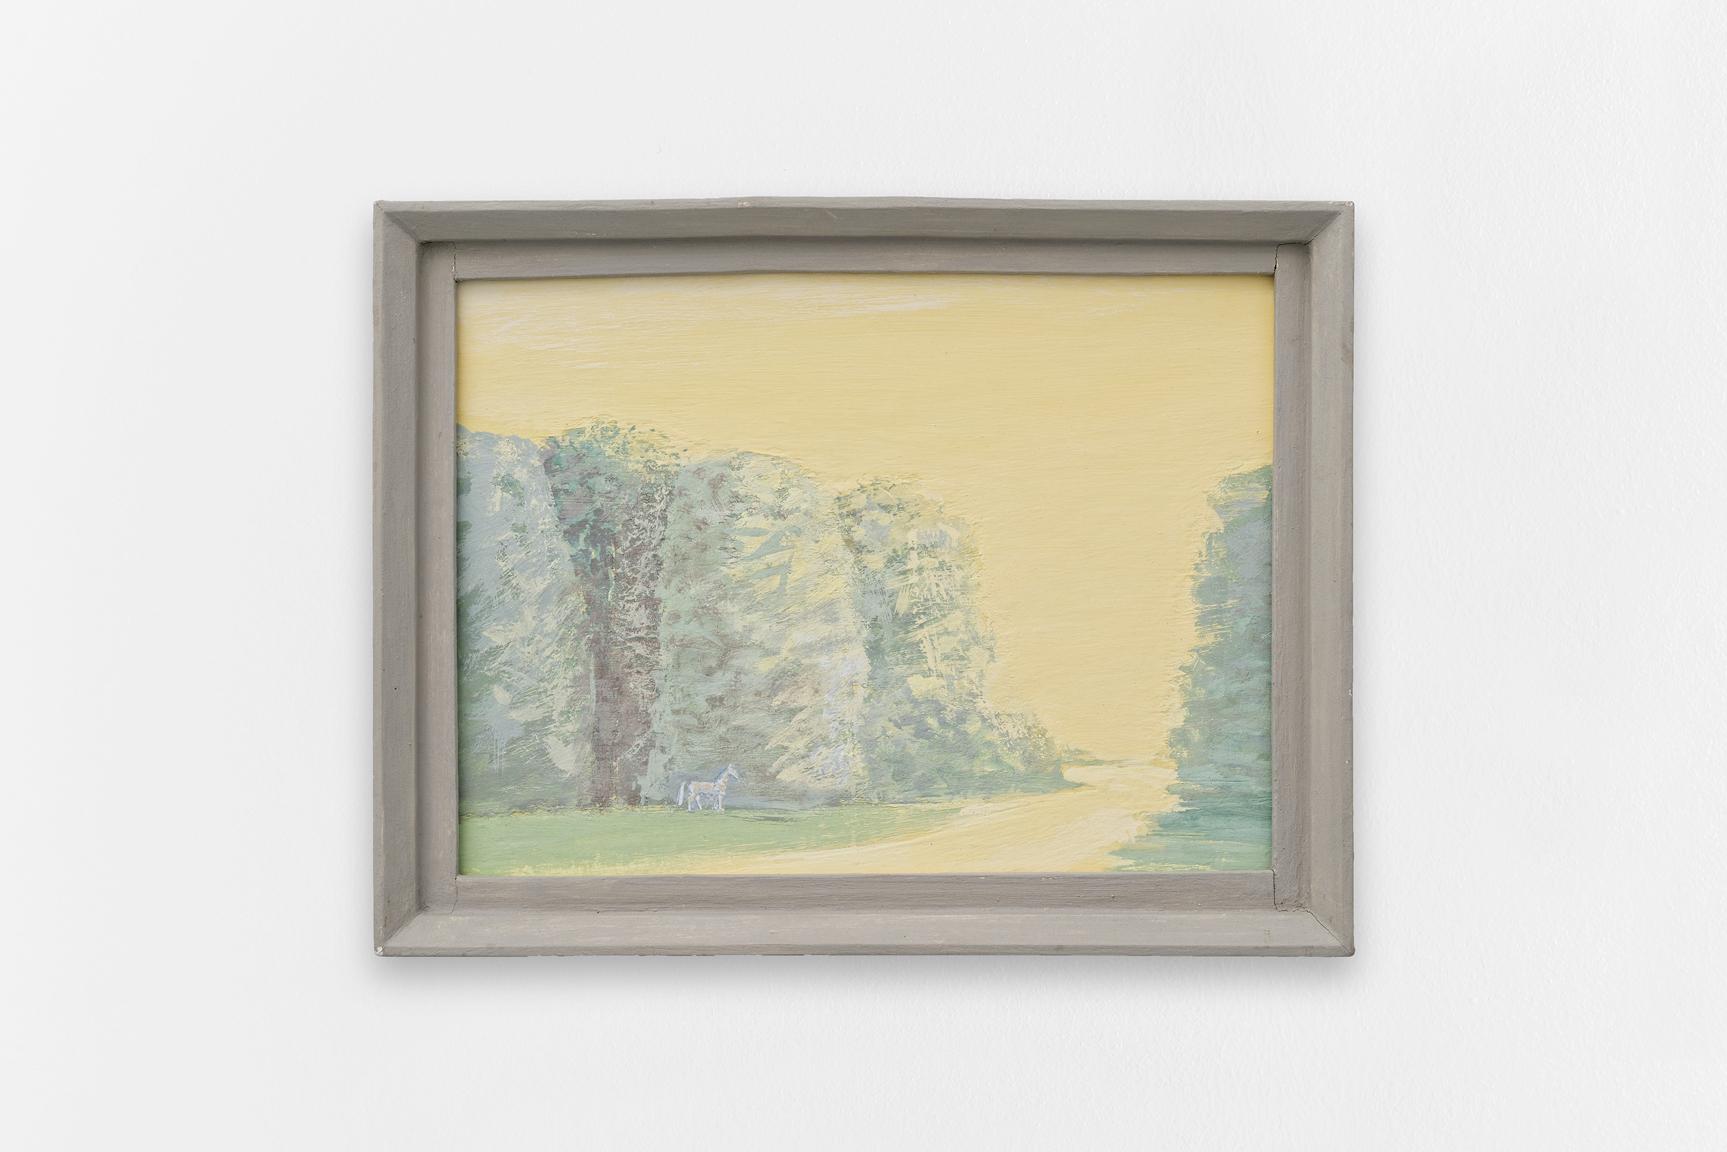 Des arbres,  Sorin Câmpan, 2018, acrylic and gesso on board, 44,5 x 34,5 cm   — Galerie Éric Hussenot, Paris